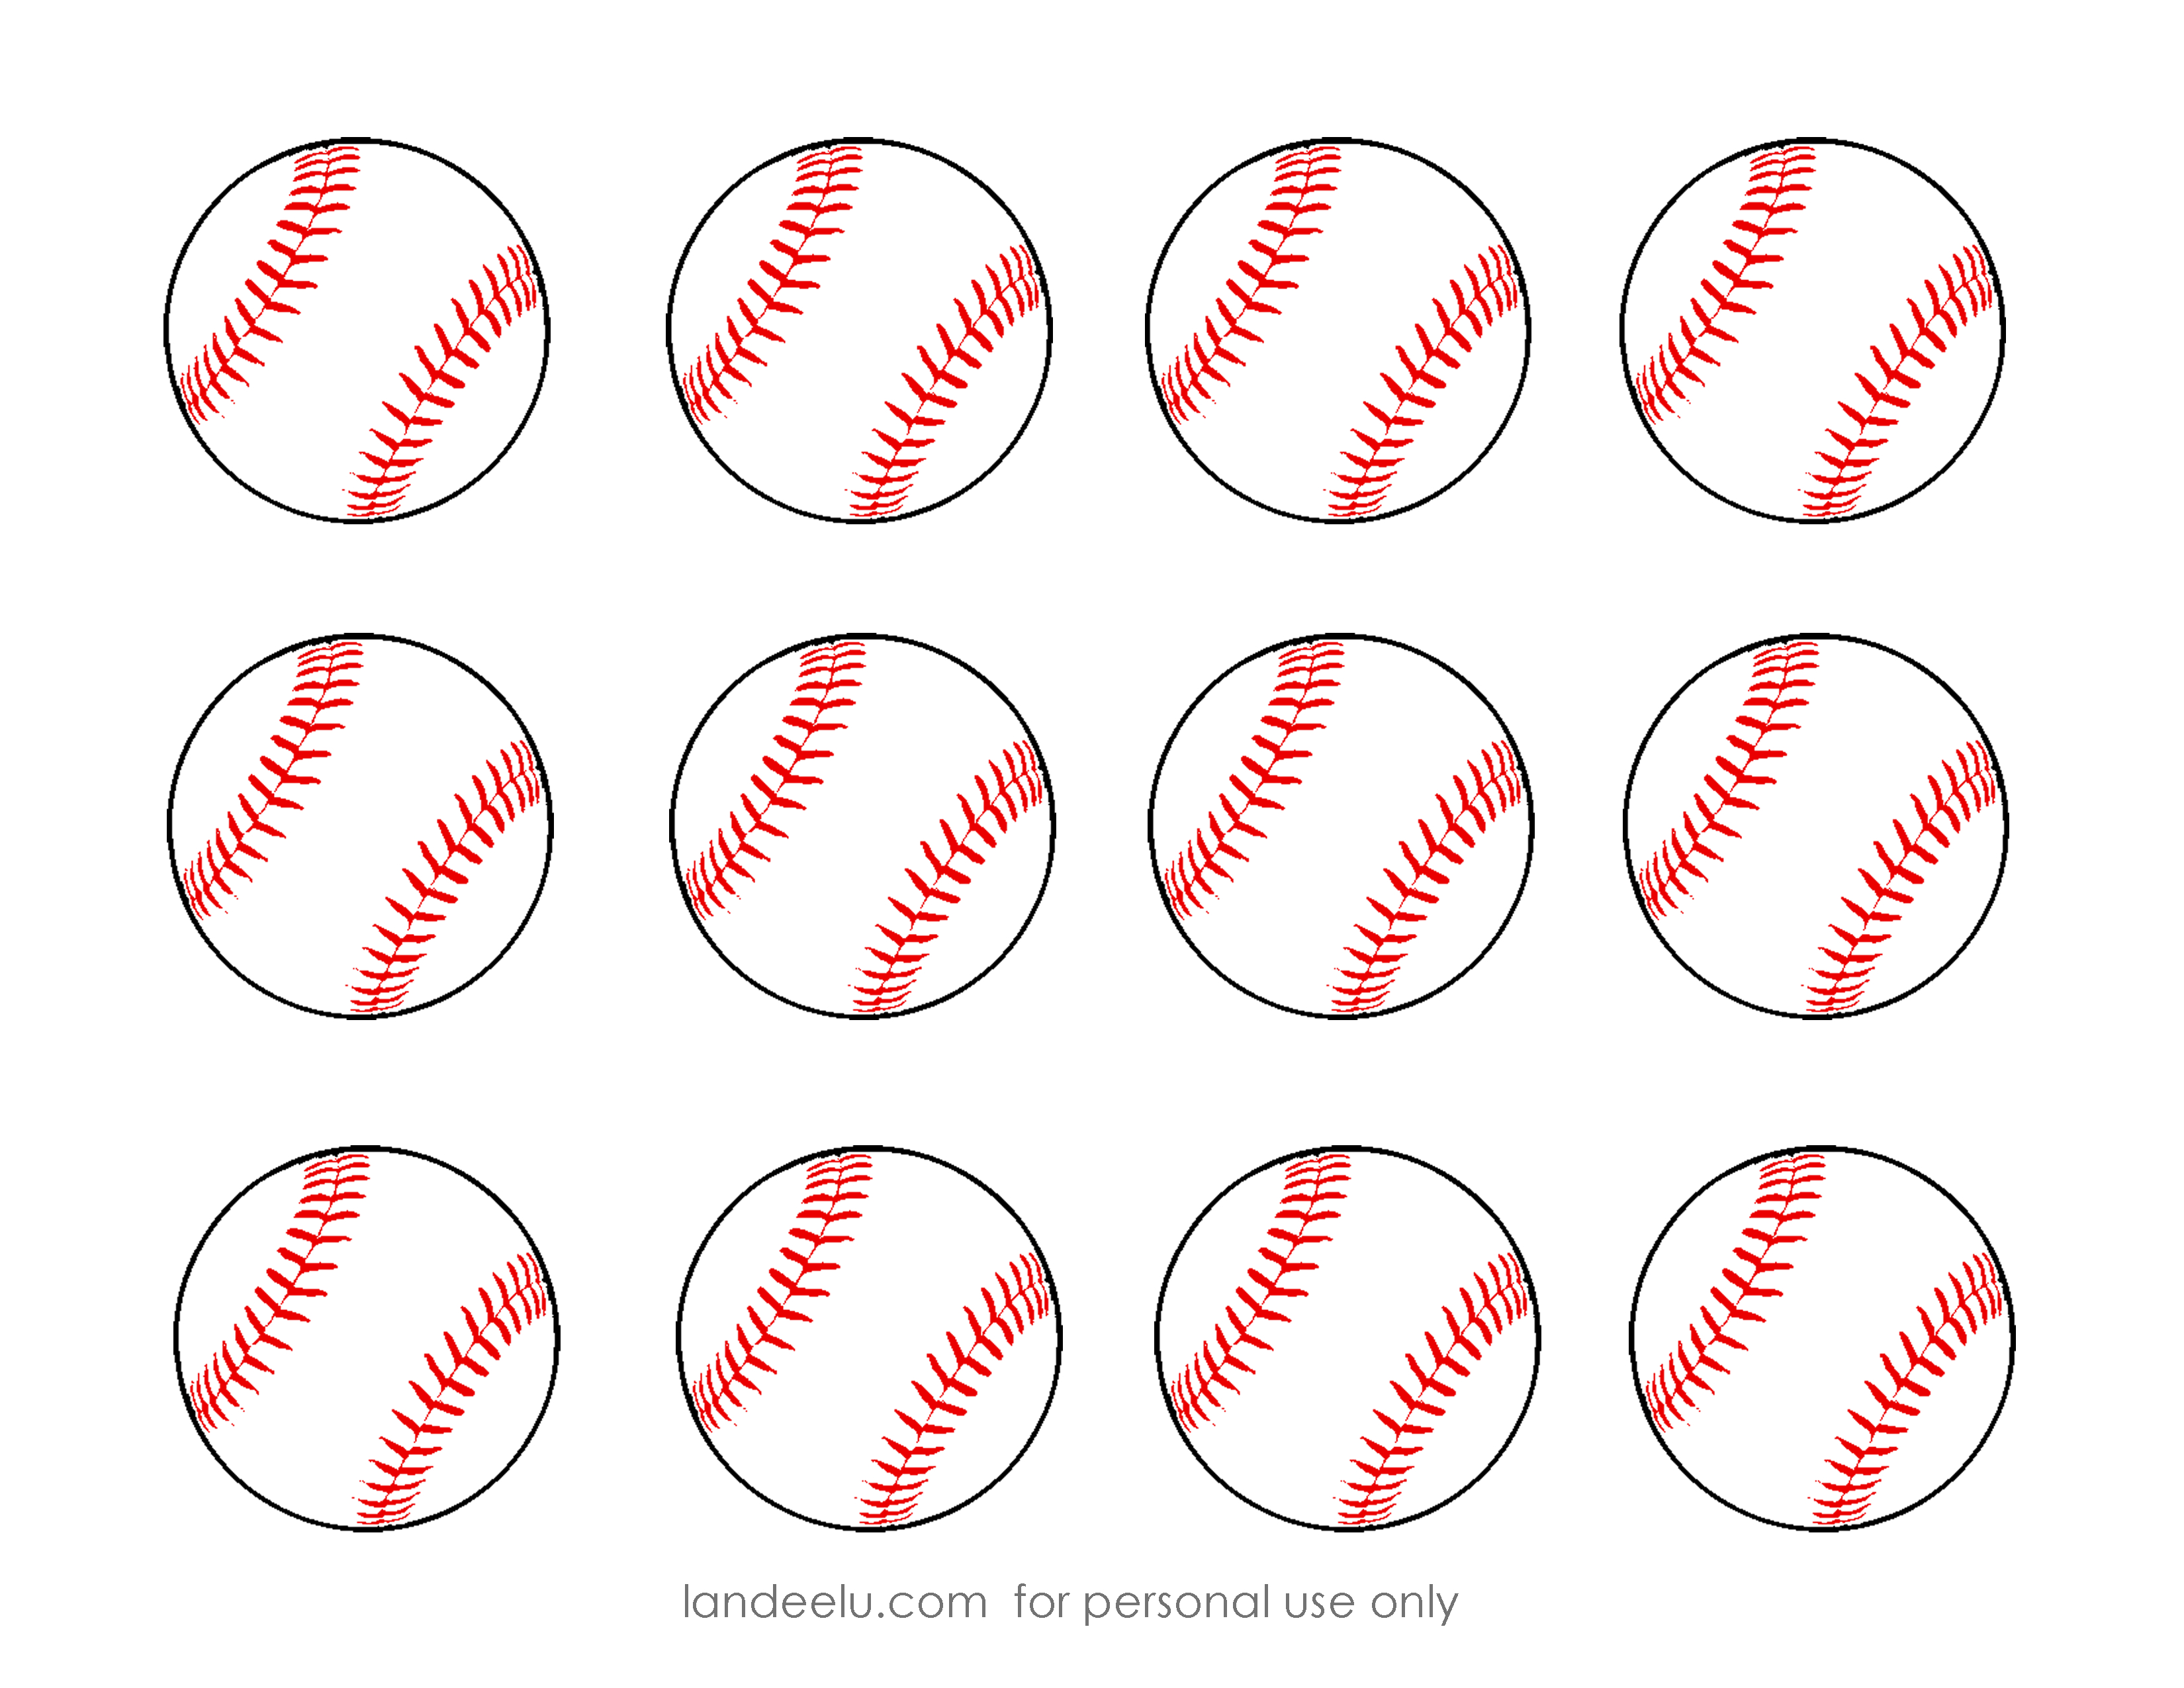 Free Printable Baseball Clip Art Images   Inch Circle Punch Or - Free Printable Baseball Logos